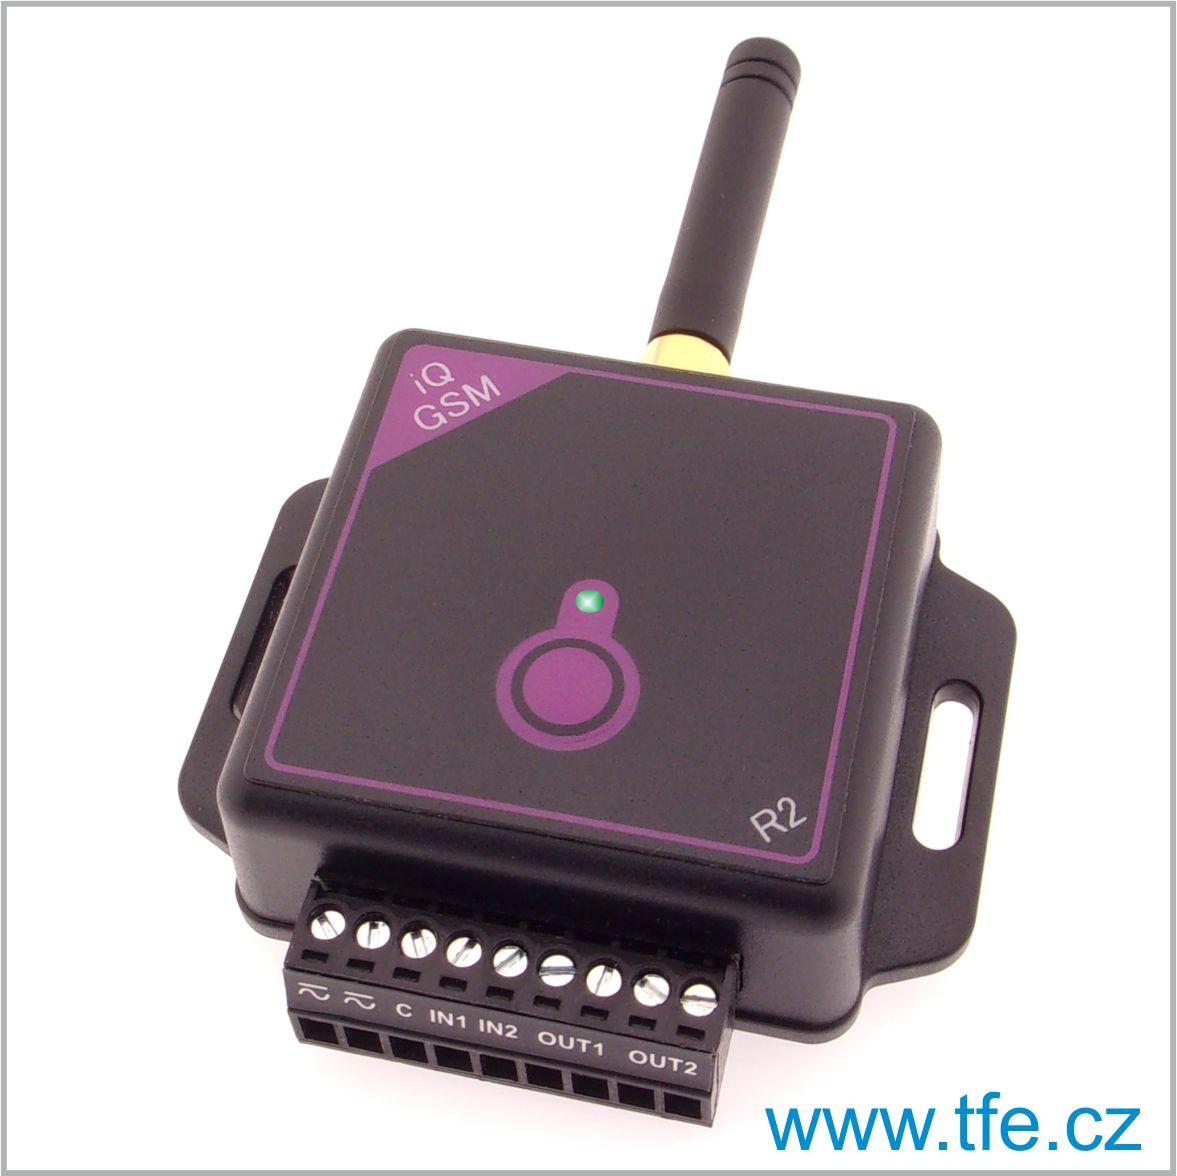 GSM klíč, GSM relé iQGSM-R2